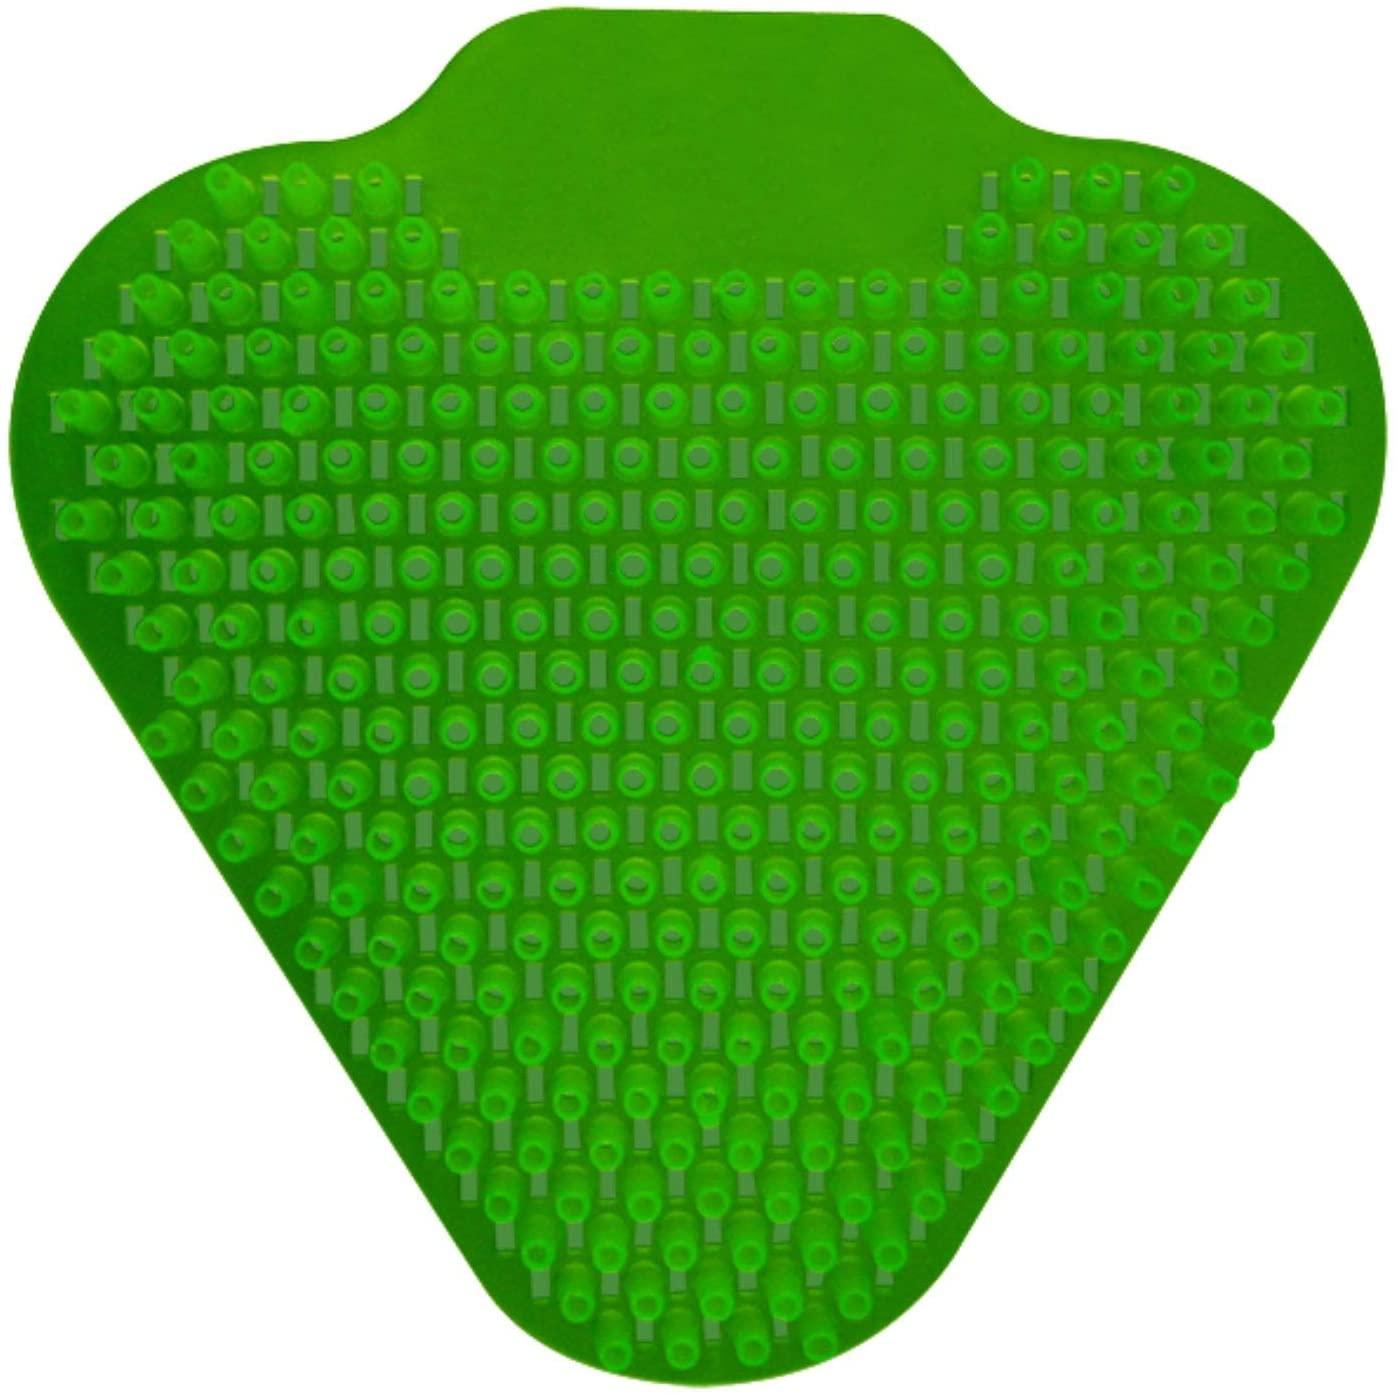 F-Matic Gel Air Green Apple Splash Reducing Urinal Screen Deodorizer - Case of 10